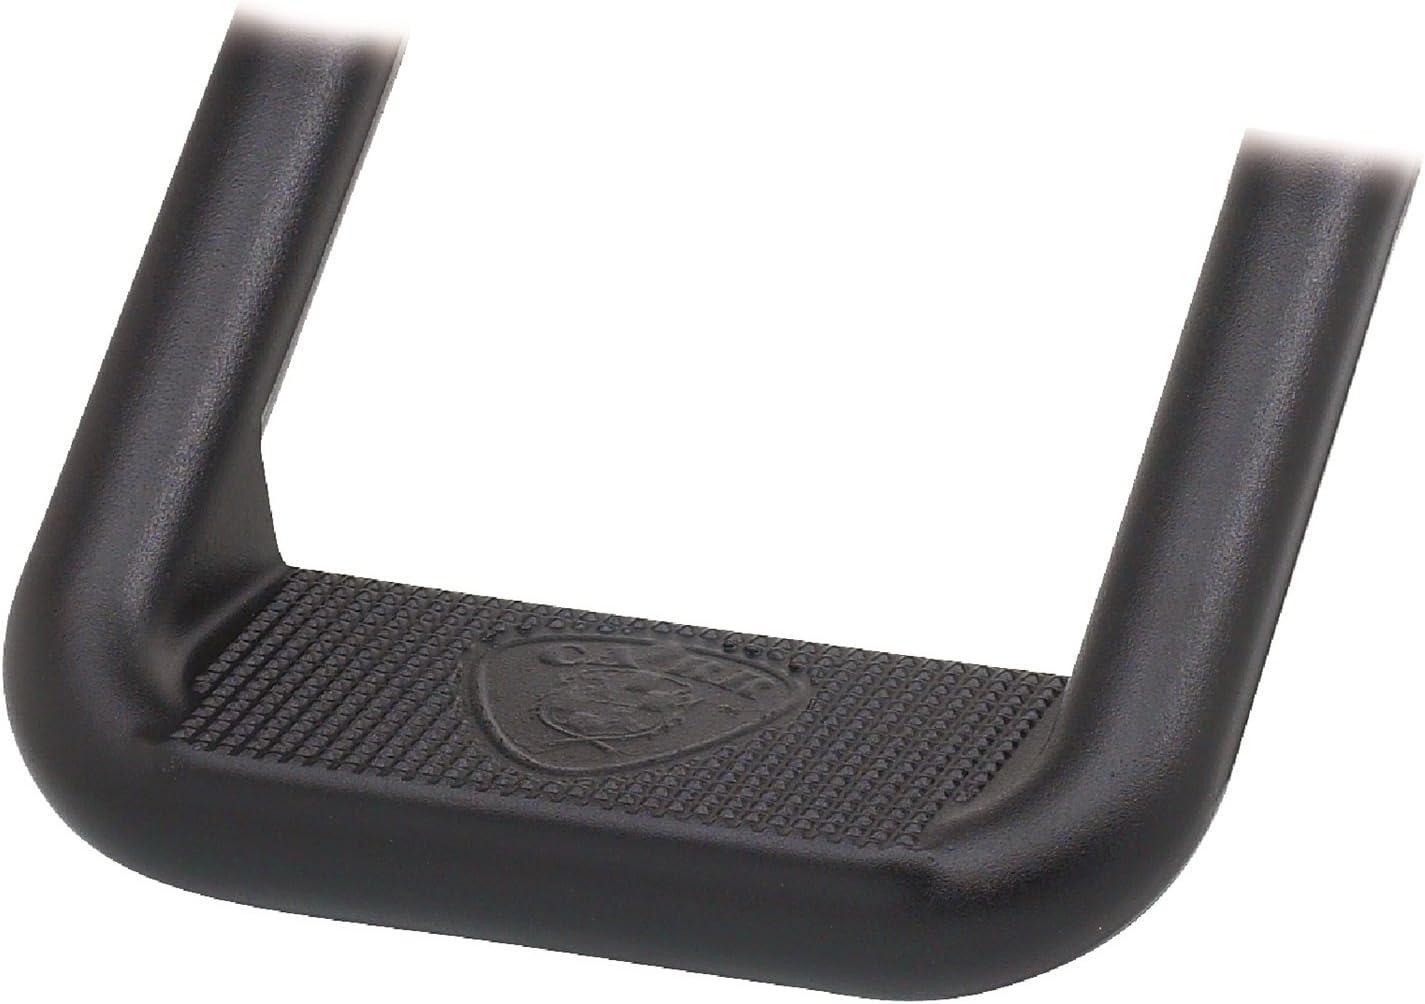 Carr 102551 Hoop II Cheap sale XP3 Coat Black Max 40% OFF Pair Powder